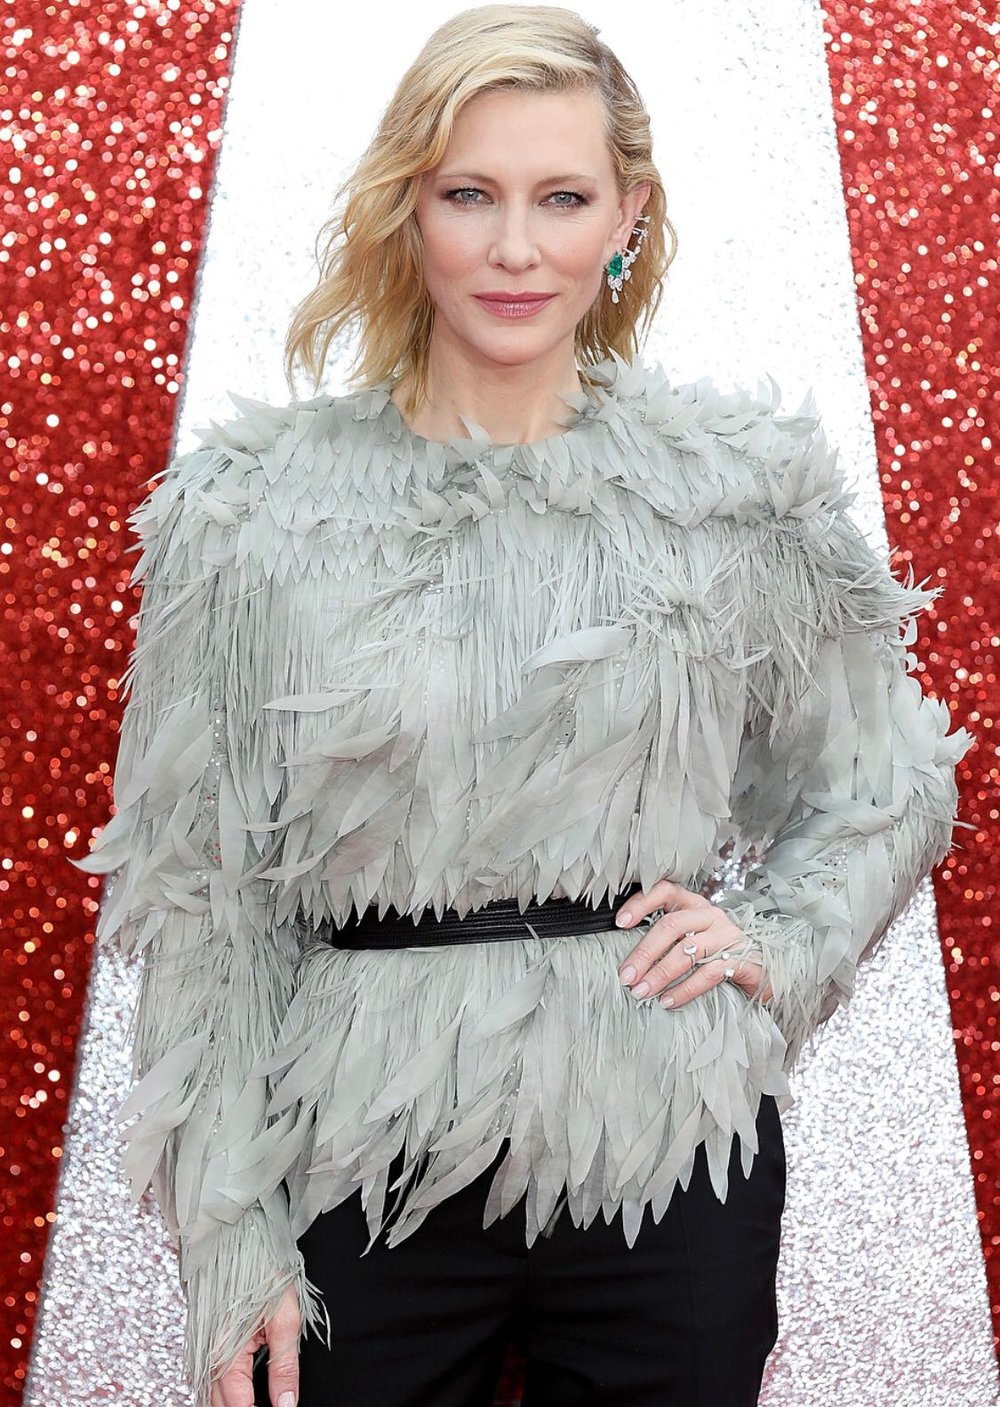 Cate Blanchett, Oceans 8 Premiere 2018 - Nails by  Morena Sanguigni